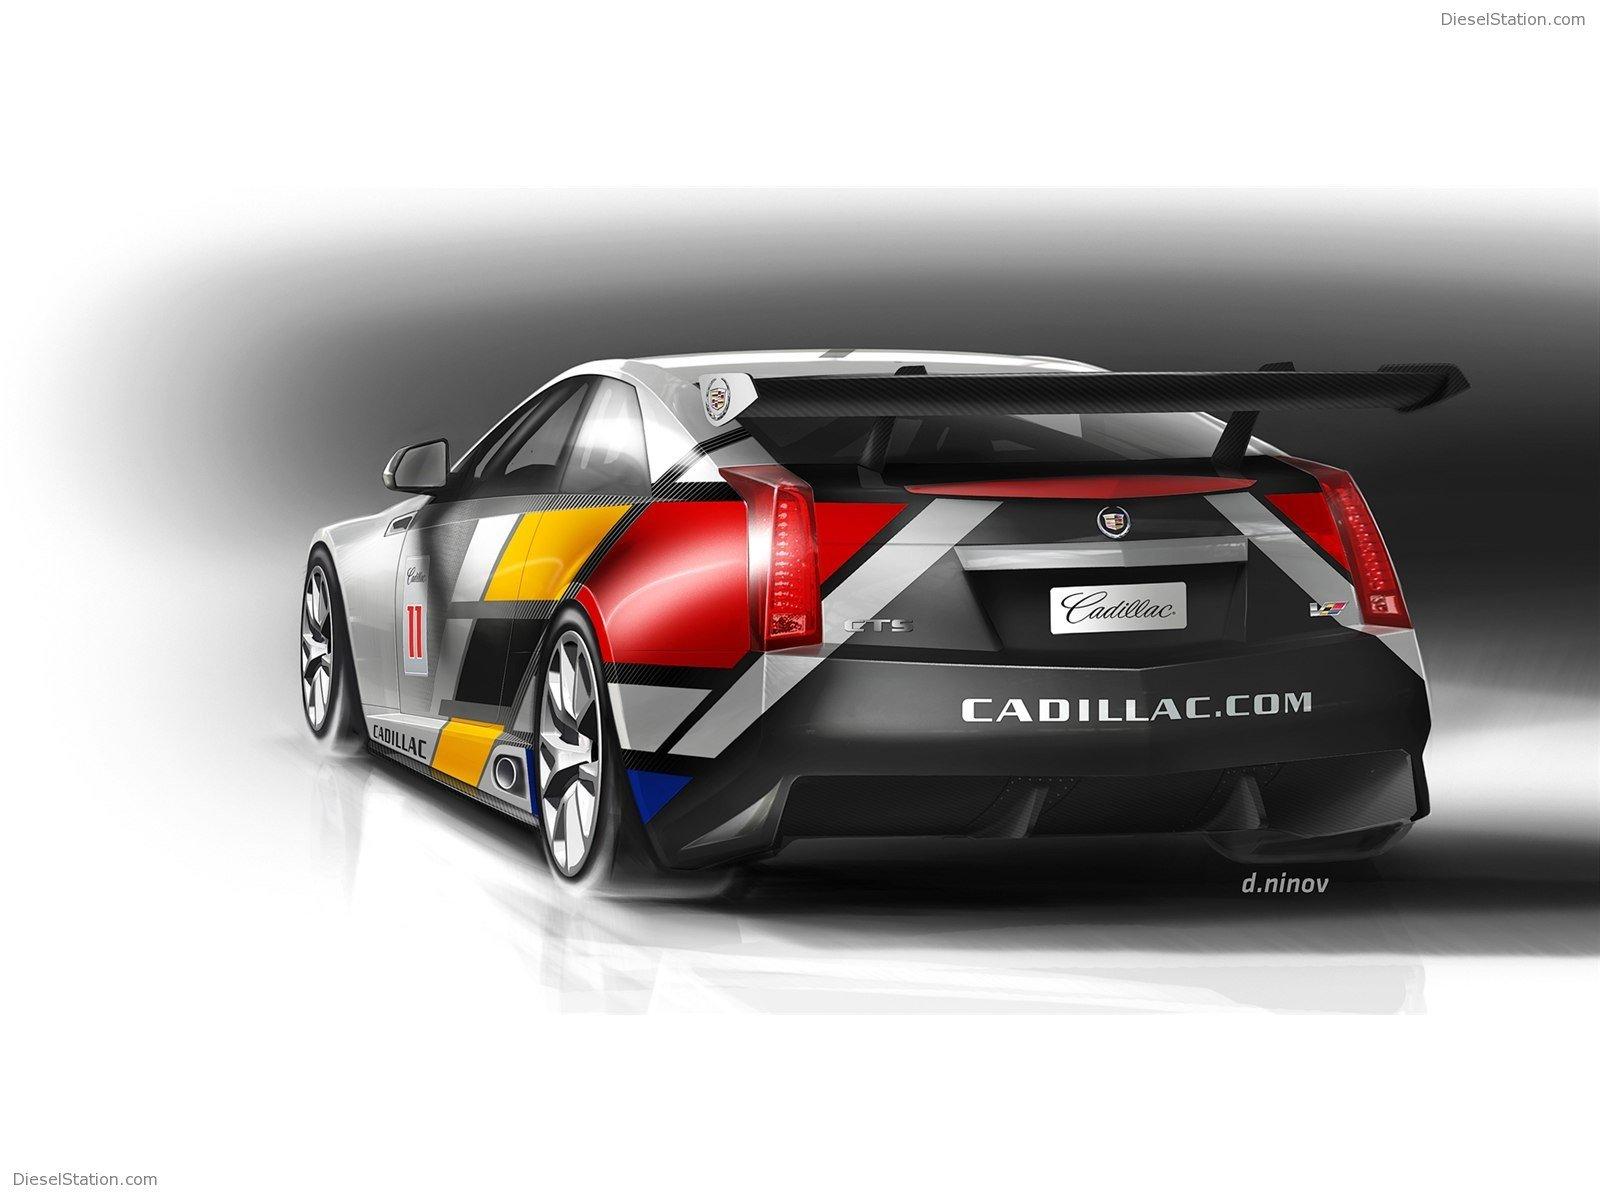 Home Cadillac Cadillac CTS V Coupe Race Car 1600x1200